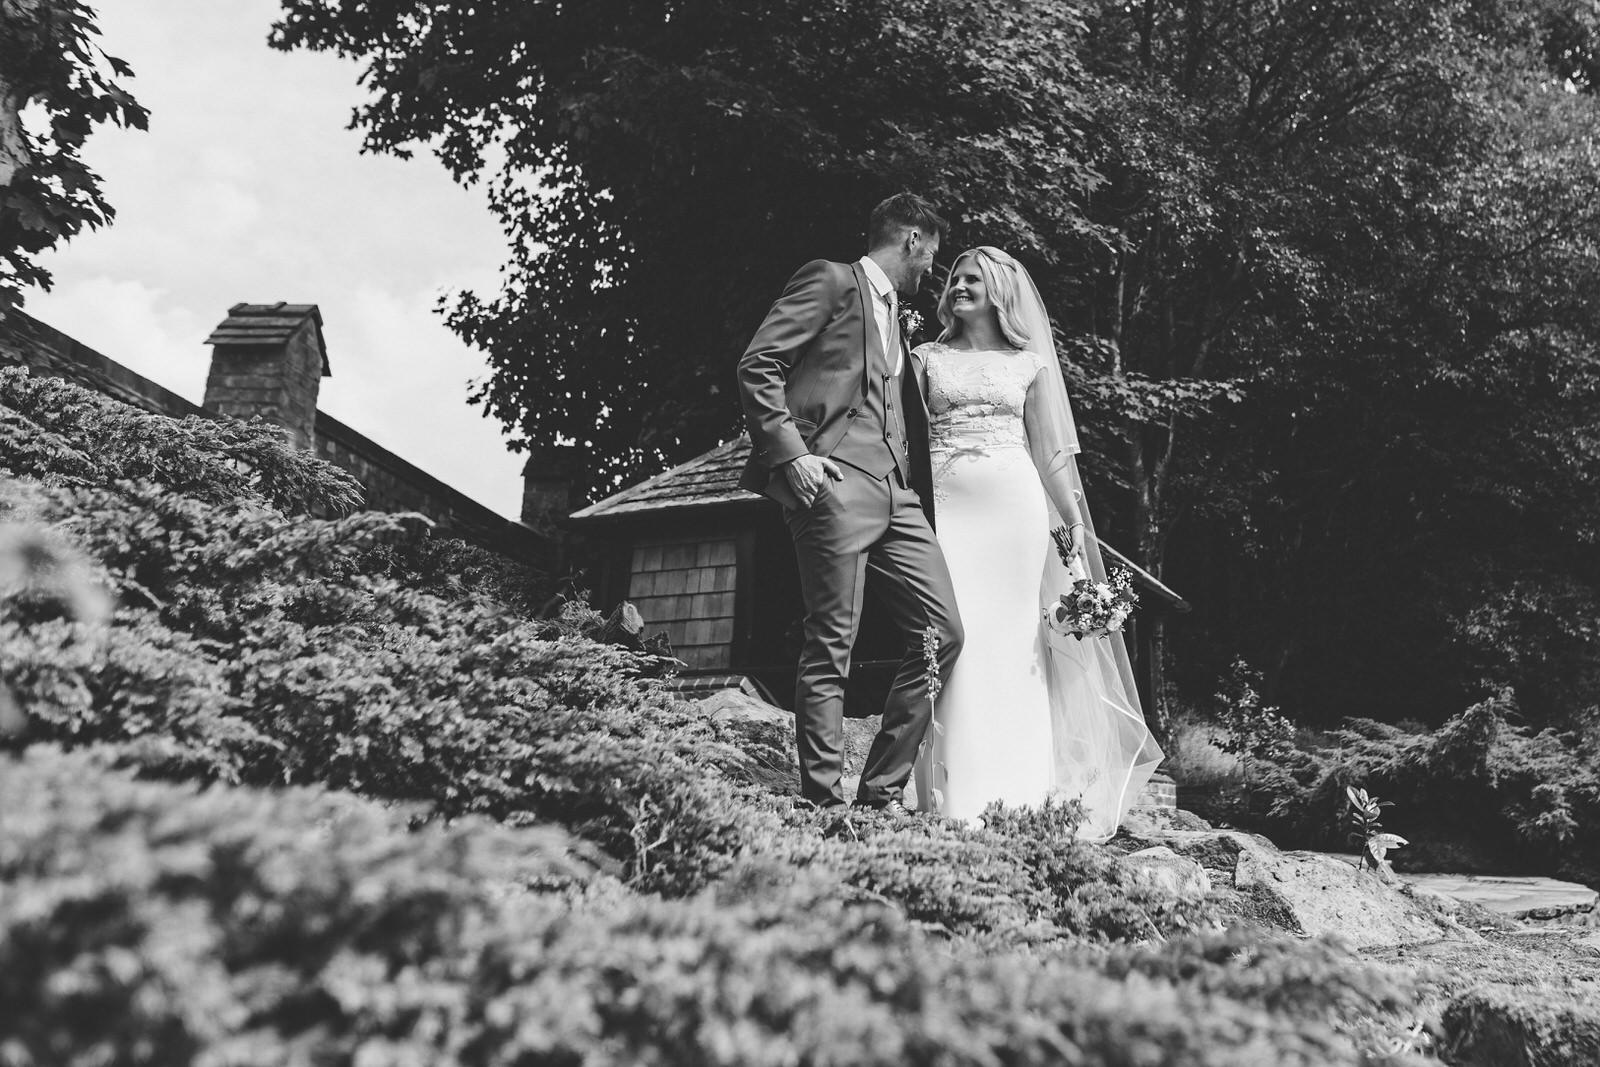 Moddershall-Oaks-Spa-Wedding-Photographer-041.jpg